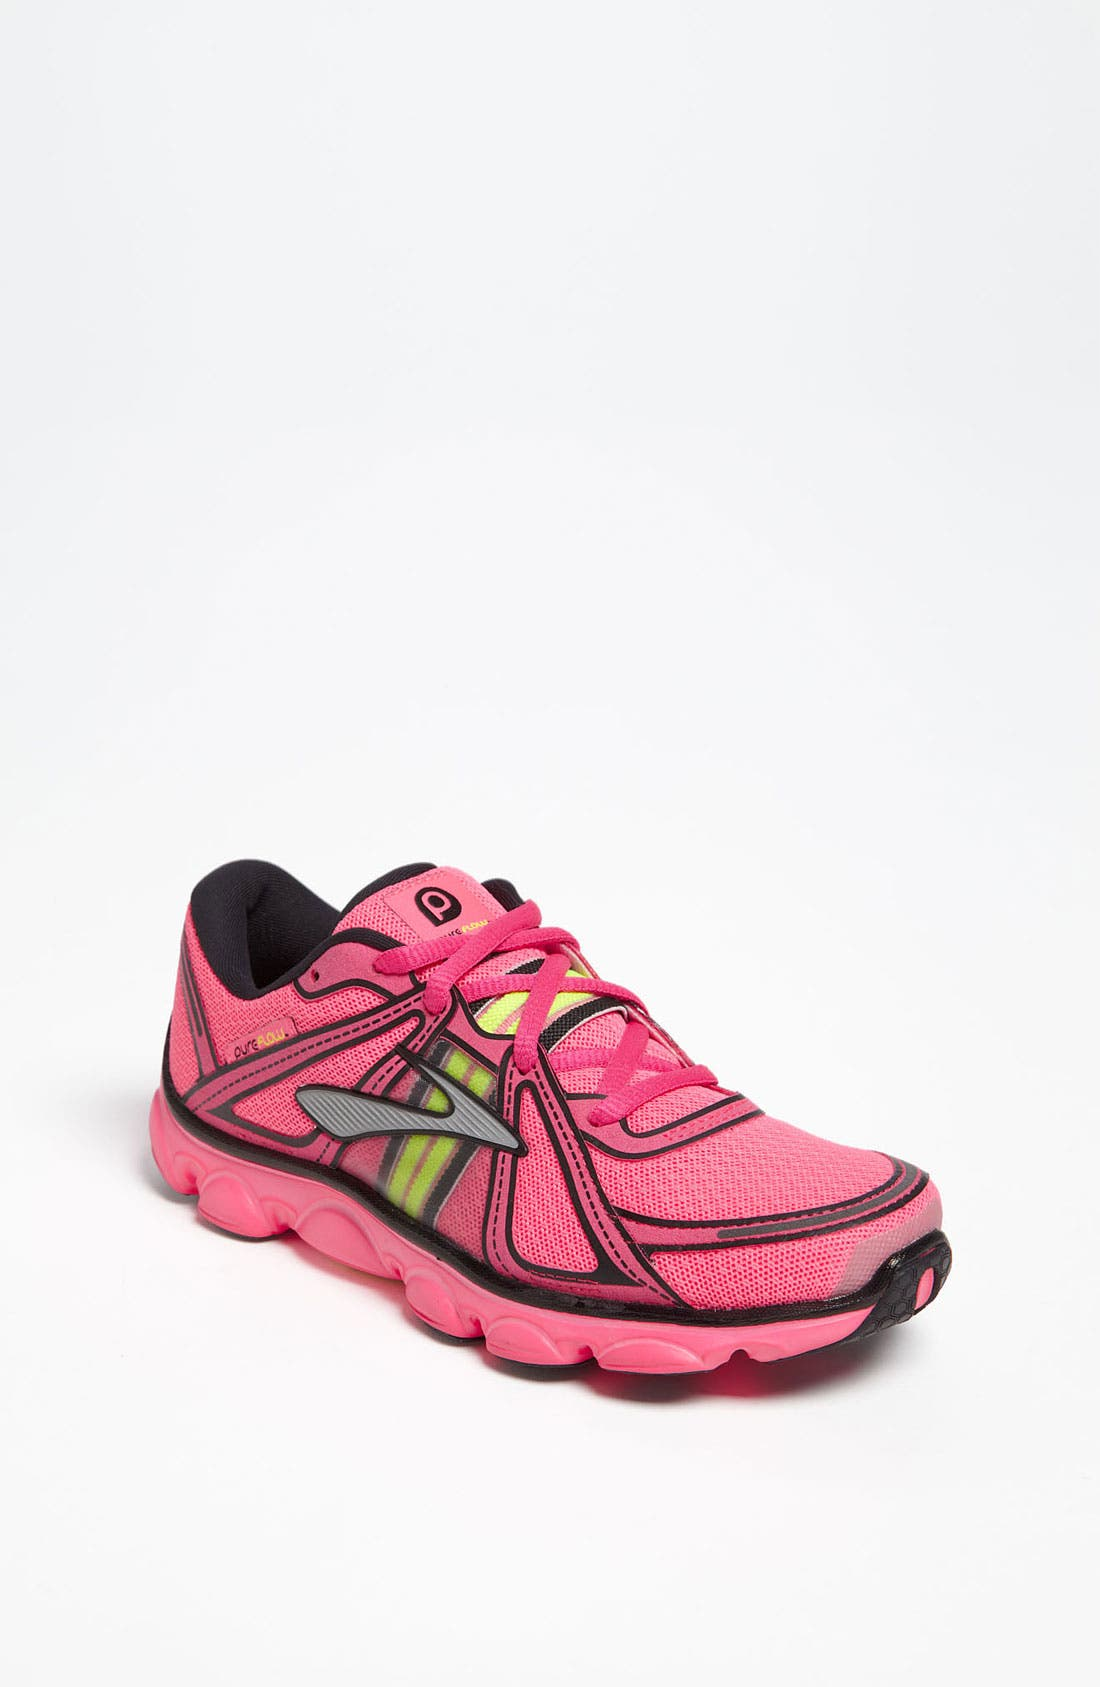 Alternate Image 1 Selected - Brooks 'Pureflow' Athletic Shoe (Toddler, Little Kid & Big Kid)